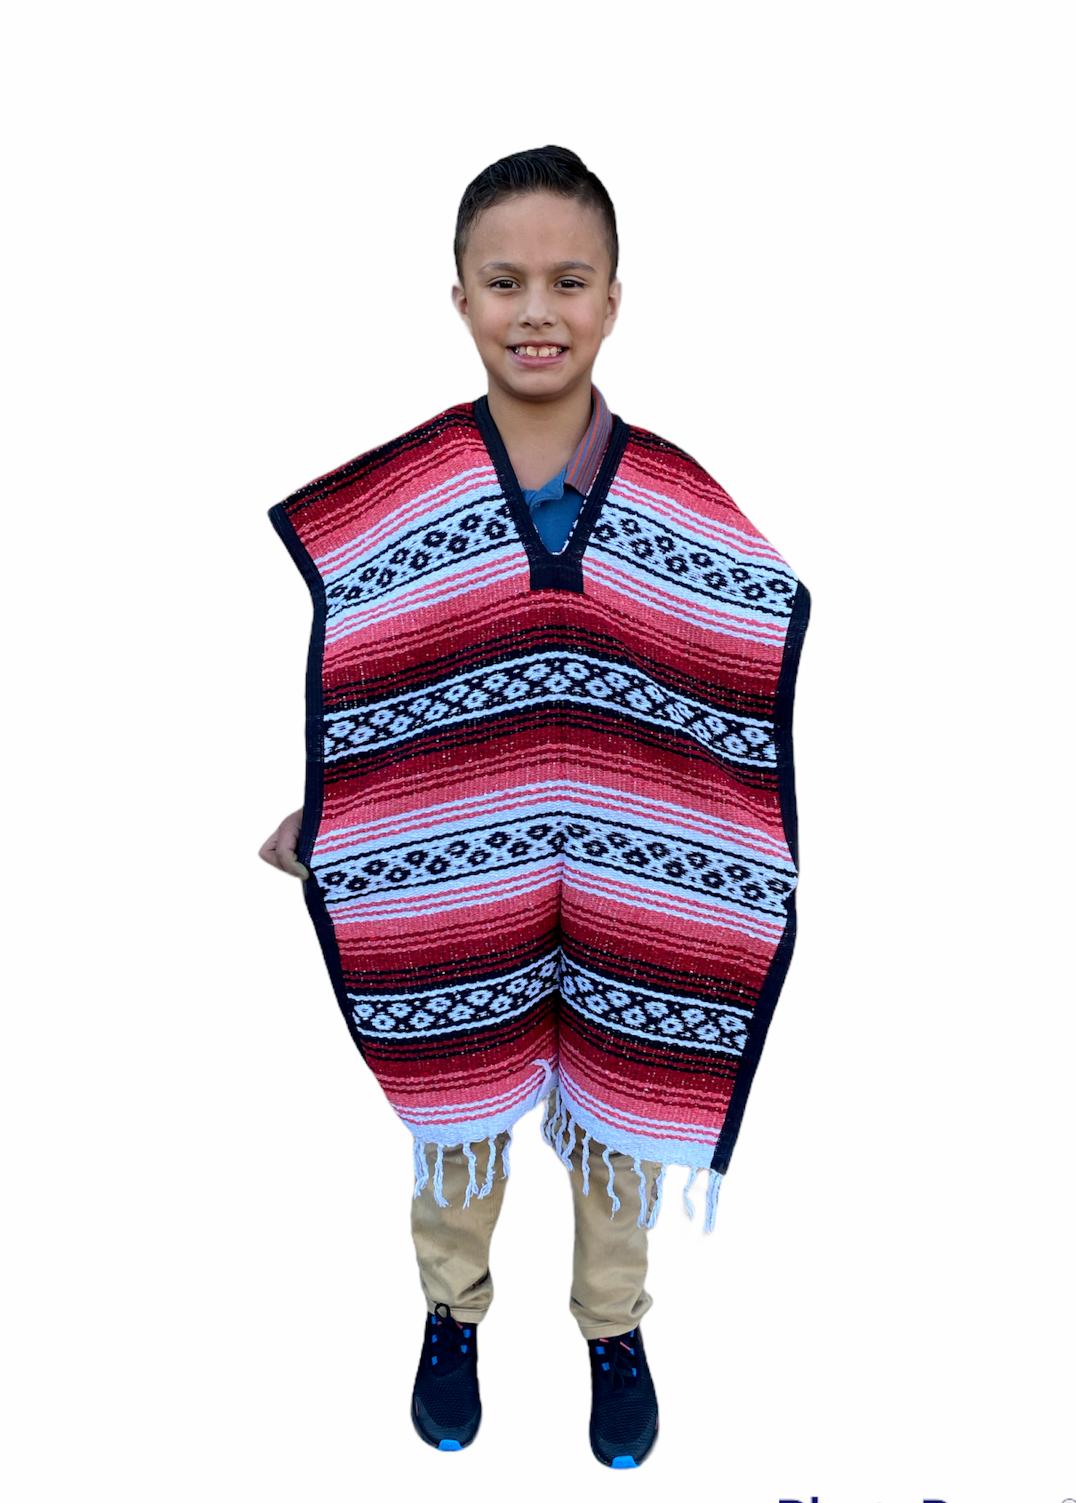 MEXICAN KIDS PONCHO , FALSA , COSTUME ,BLANKET SERAPE GABAN ,KIDS 8 - 12 , RED